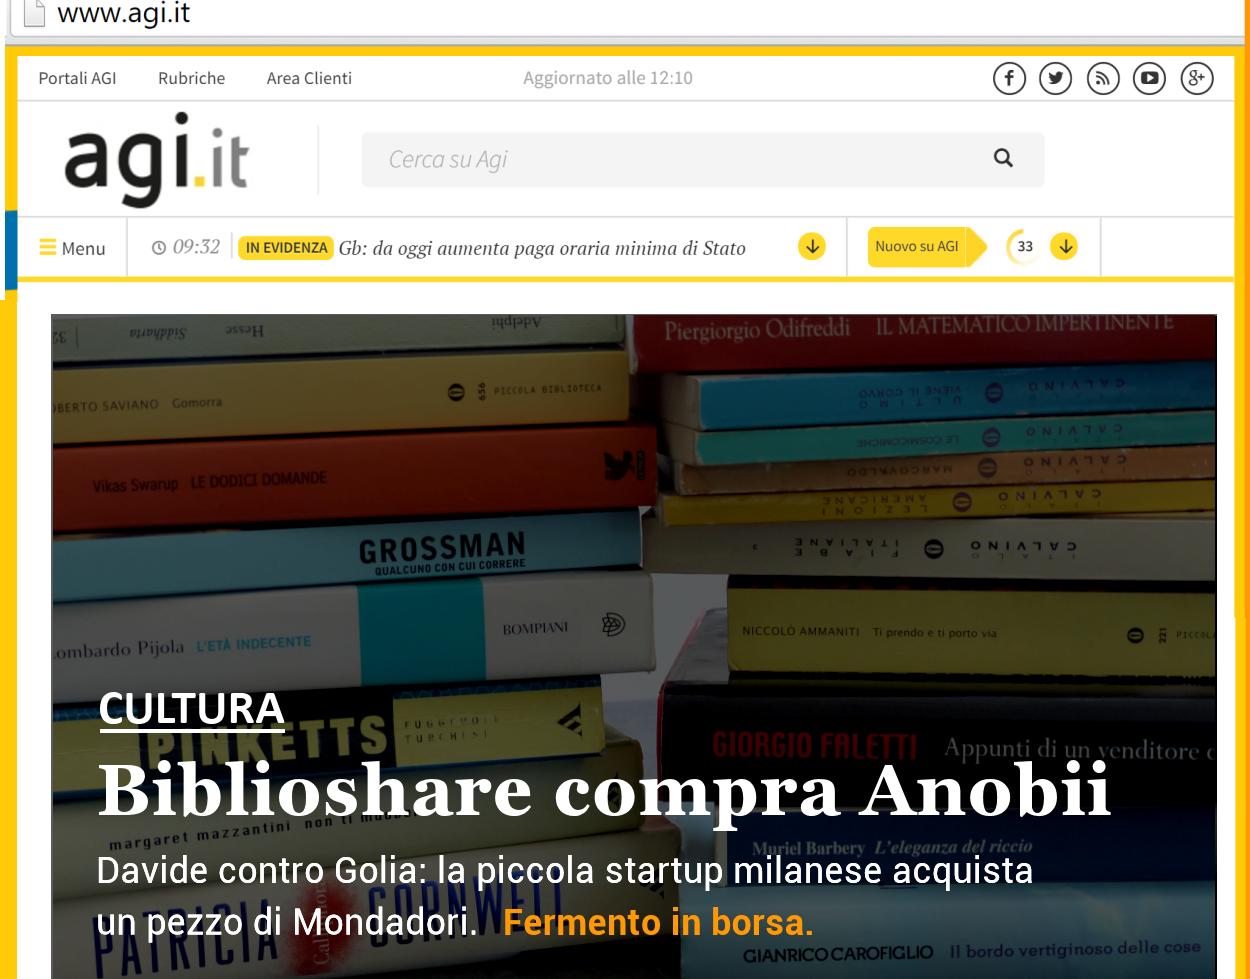 Biblioshare acquista Anobii